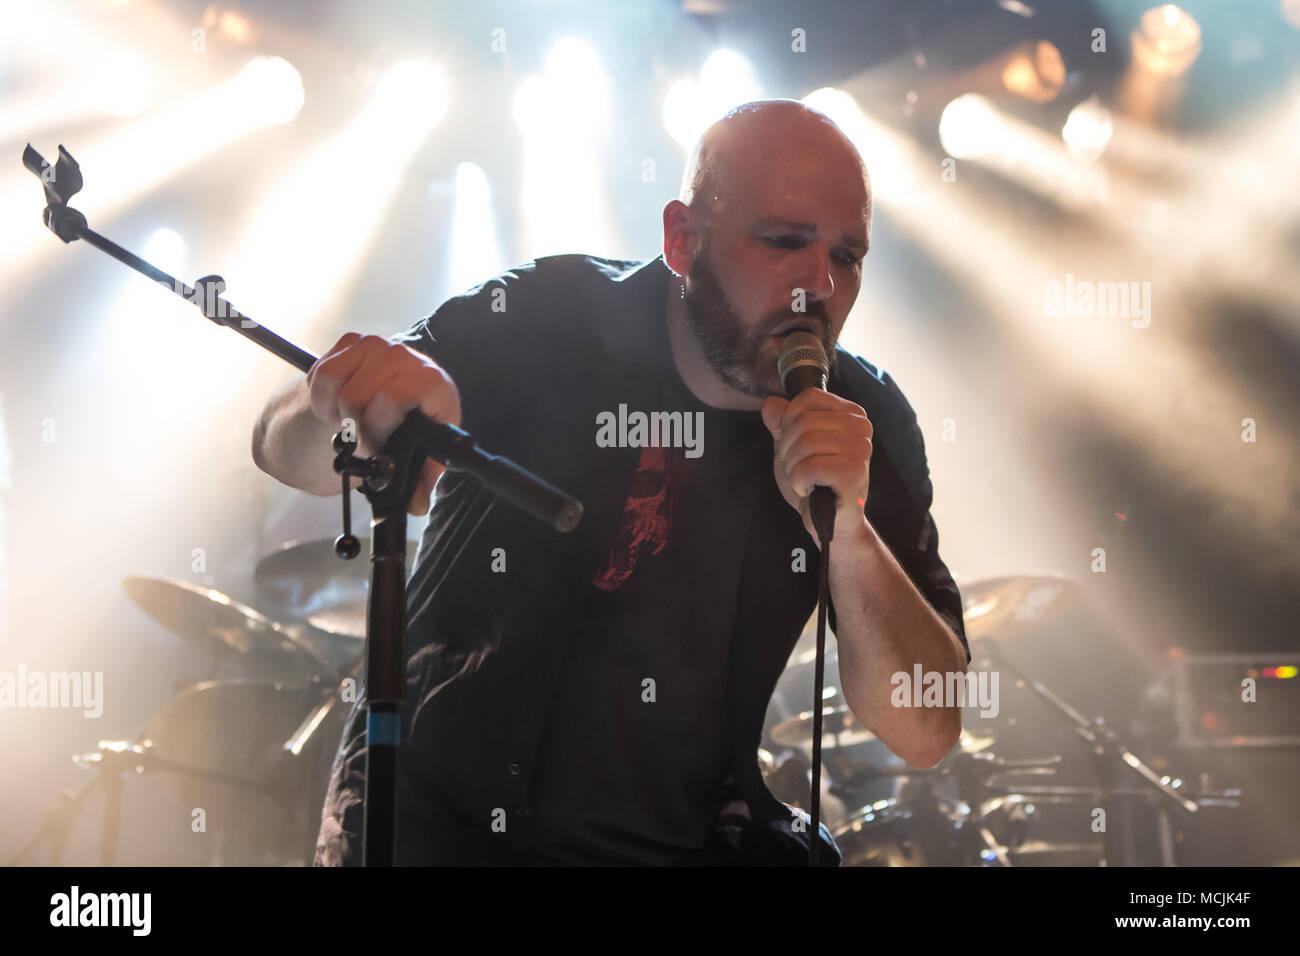 Andre Ellenberger cantante de la banda suiza de metal Piranha Schüür viven en Lucerna, Suiza Foto de stock